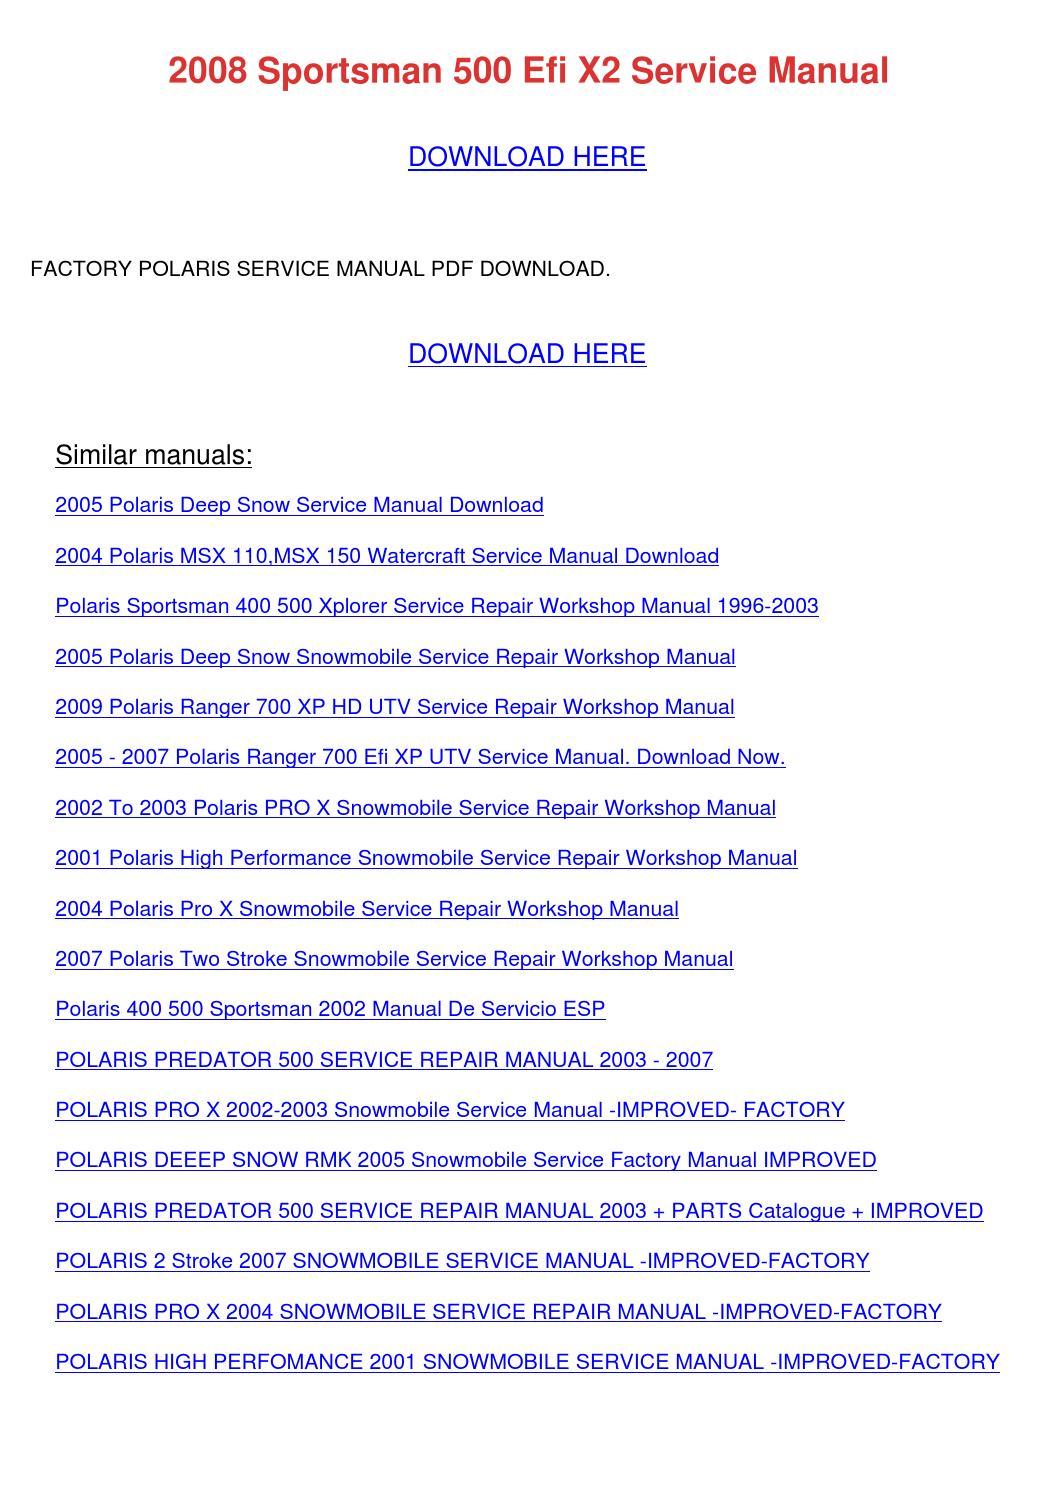 hight resolution of by jeffrey o bennett student study guide and solutions polaris ranger d diesel crew utv service repair manual polaris hawkeye ho h polaris industries